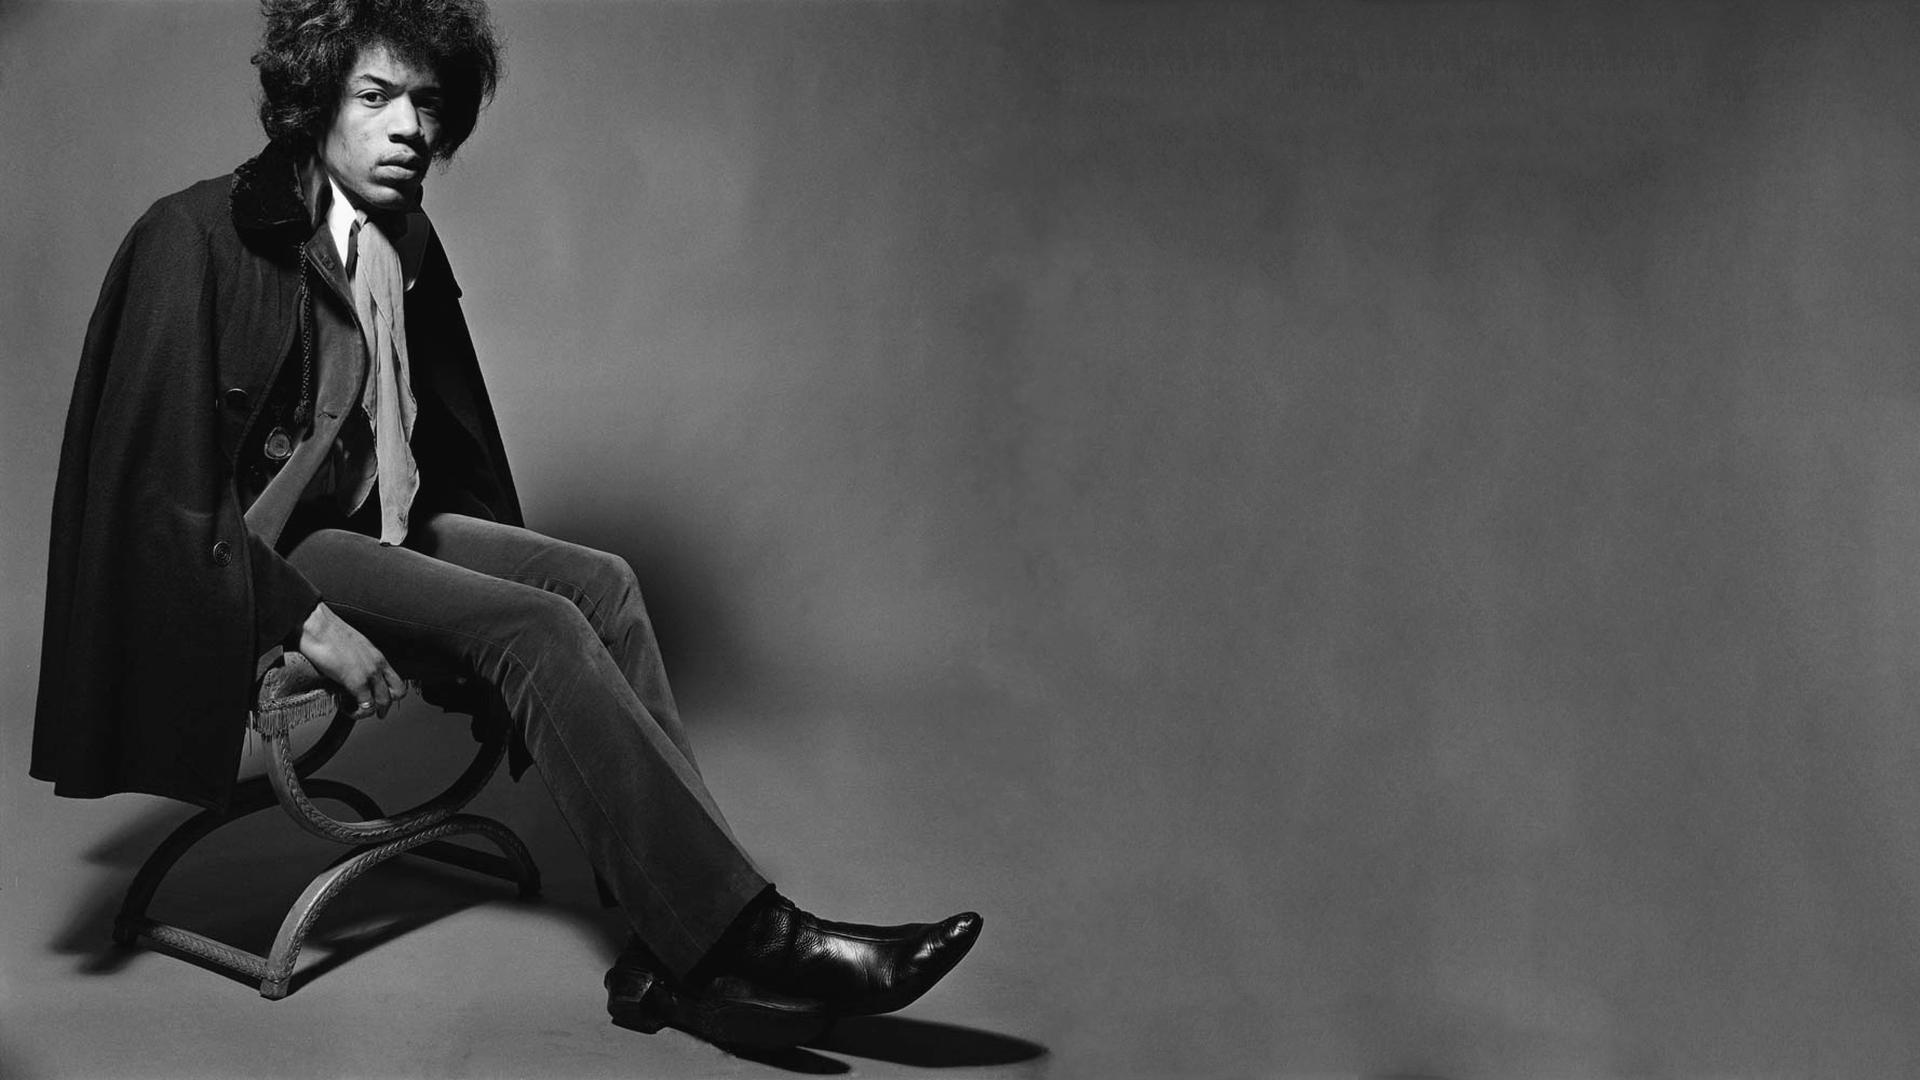 Jimi Hendrix Fondo De Pantalla Hd Fondo De Escritorio